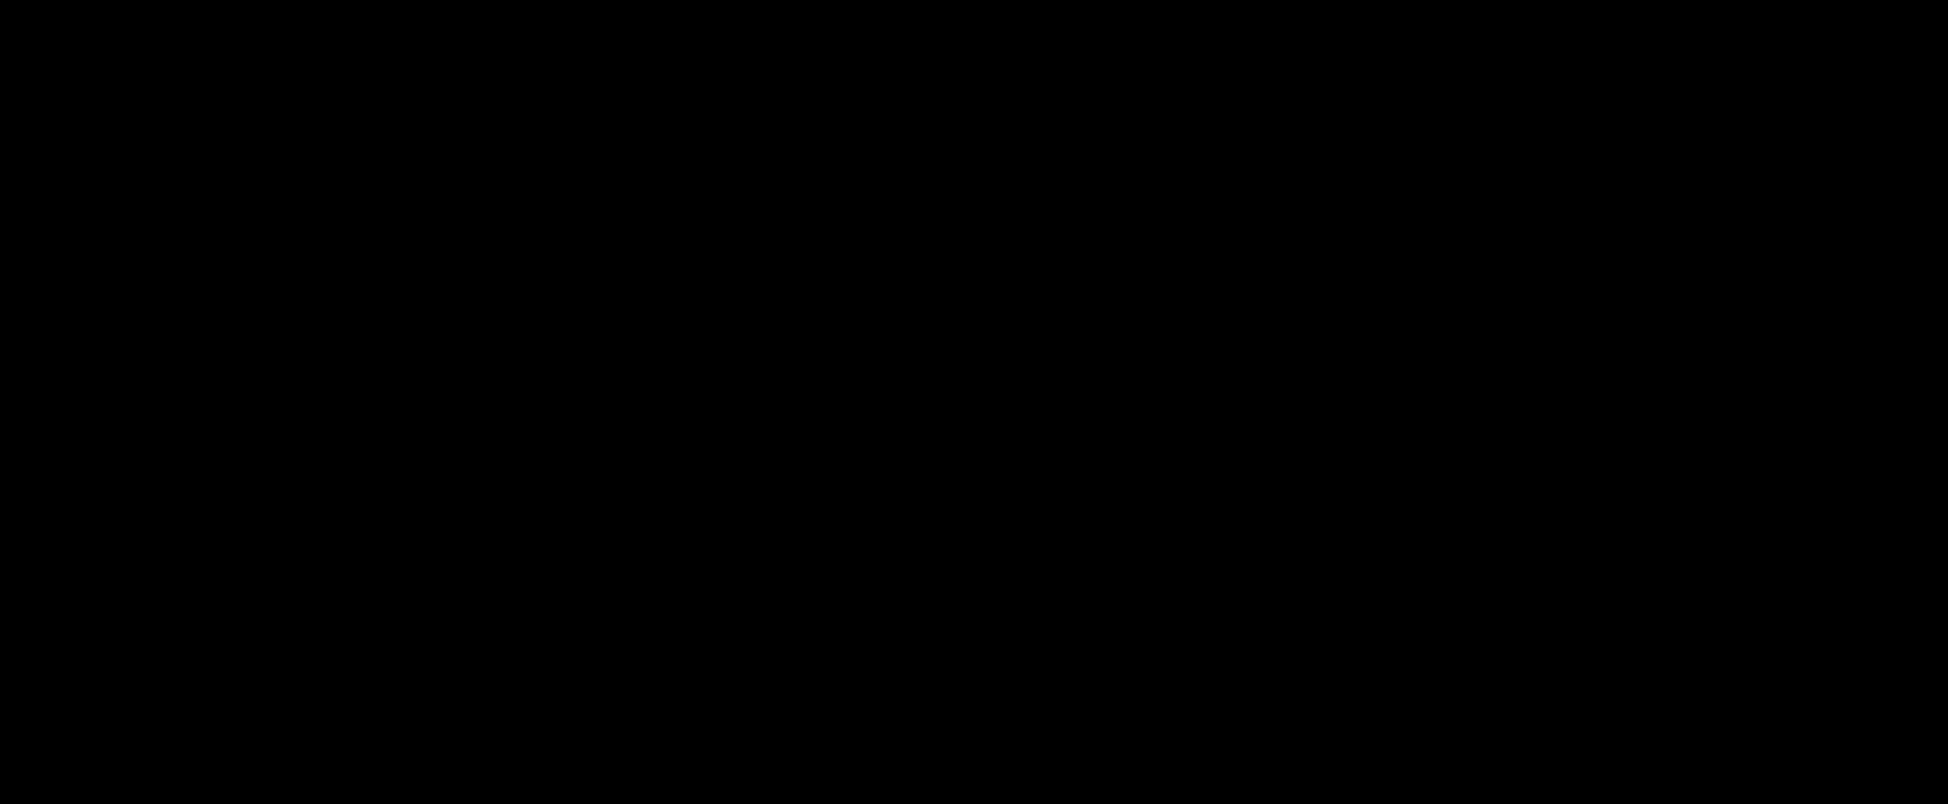 enhanced_logos_region8-04